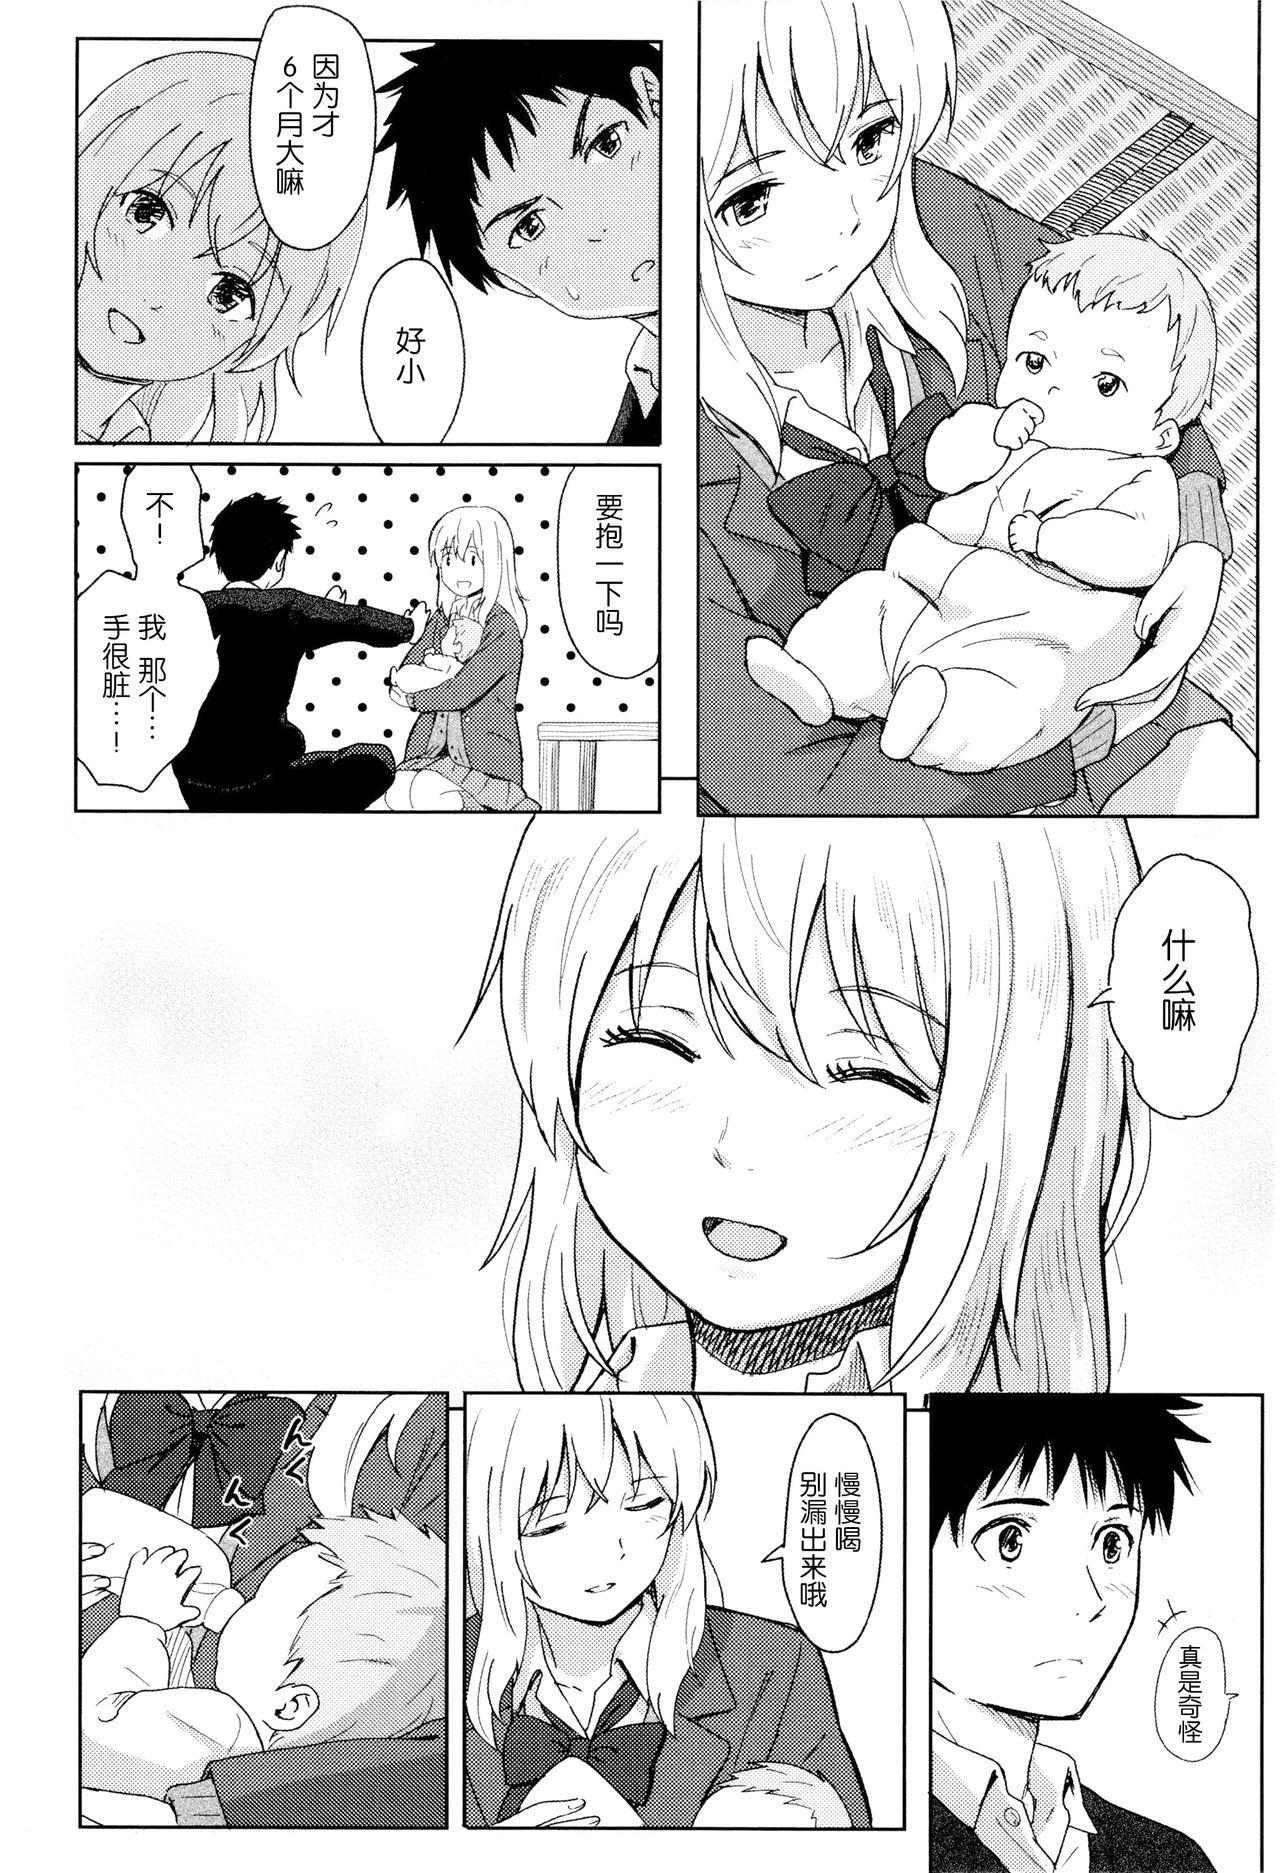 Tokubetsu na Mainichi - Special daily 16